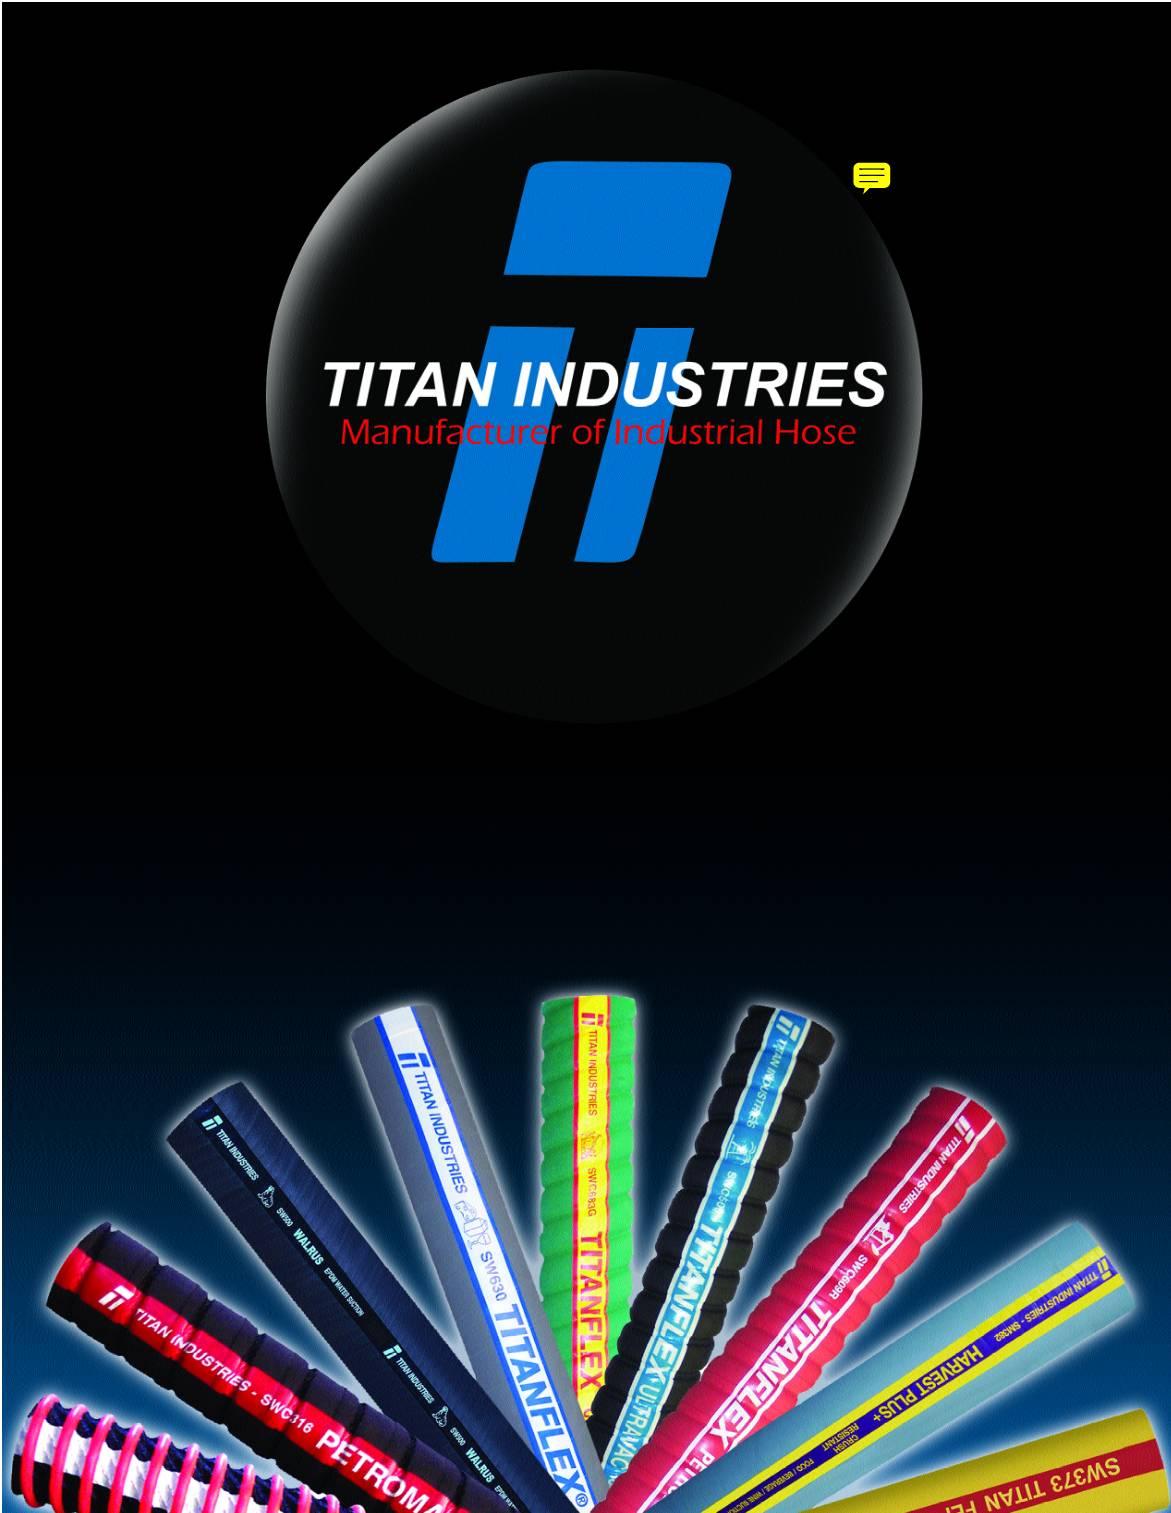 Parker Titan Industrial Hose Division